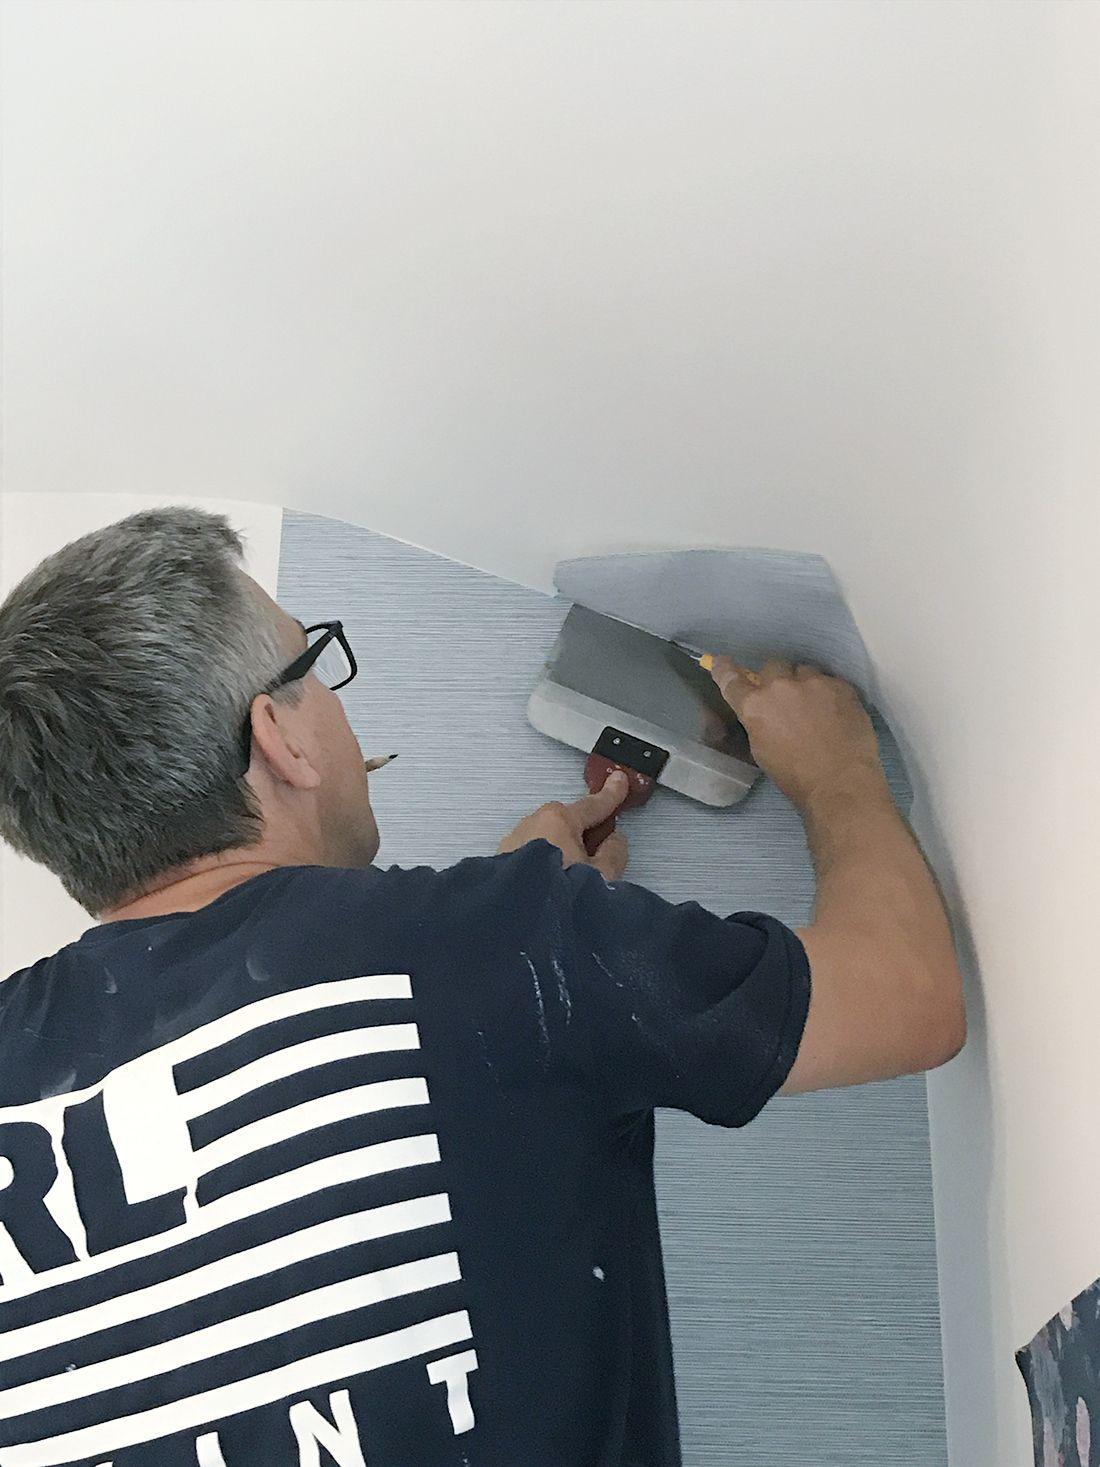 Rambling Renovators Paste The Wall Wallpaper Tips In 2021 Wall Wallpaper Wallpapering Tips Grasscloth Wallpaper